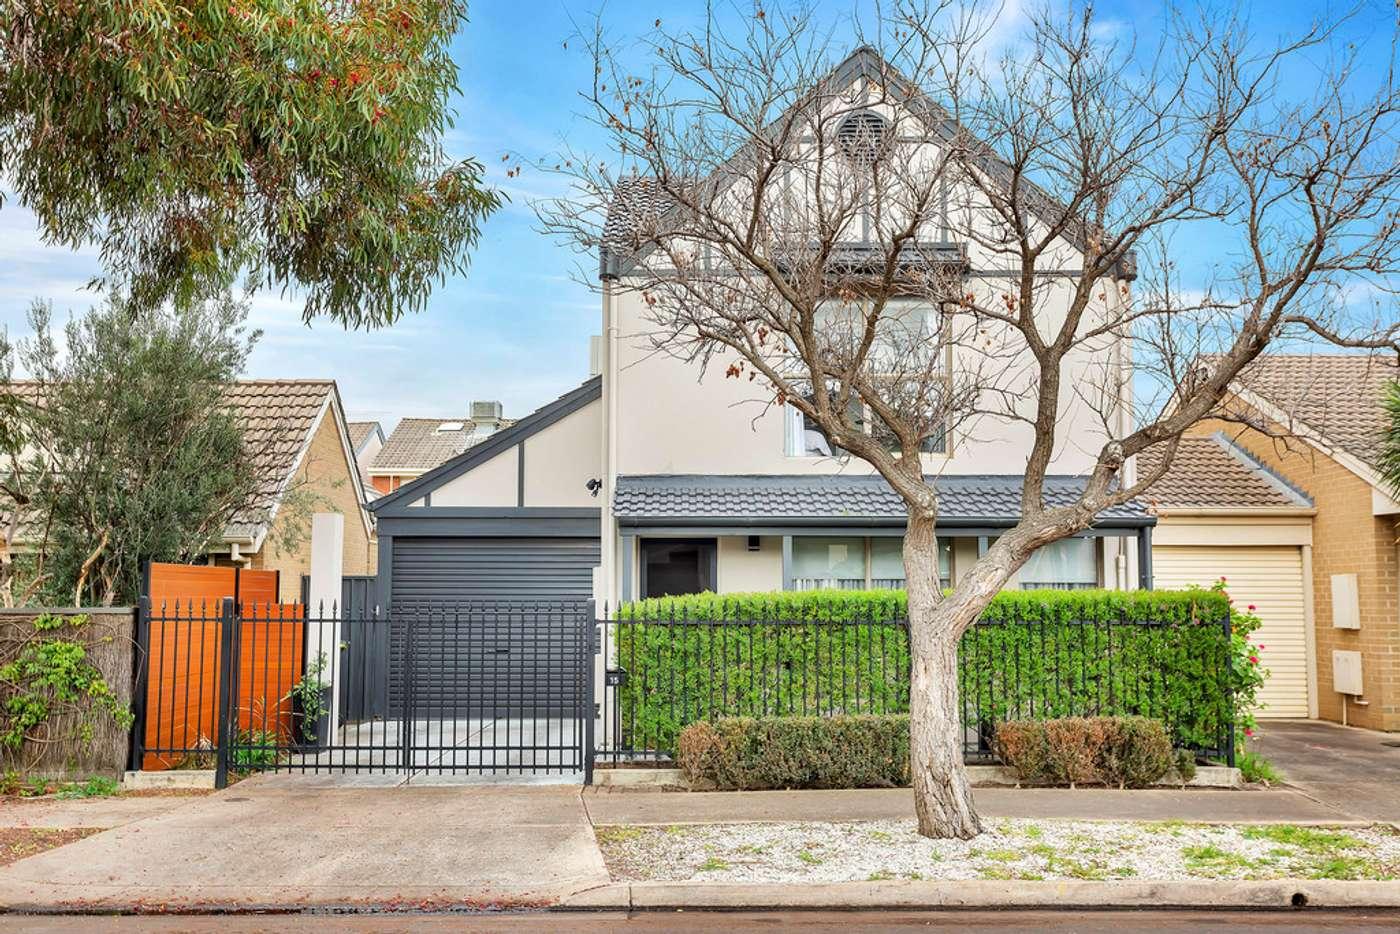 Main view of Homely house listing, 15 Blight Street, Ridleyton SA 5008